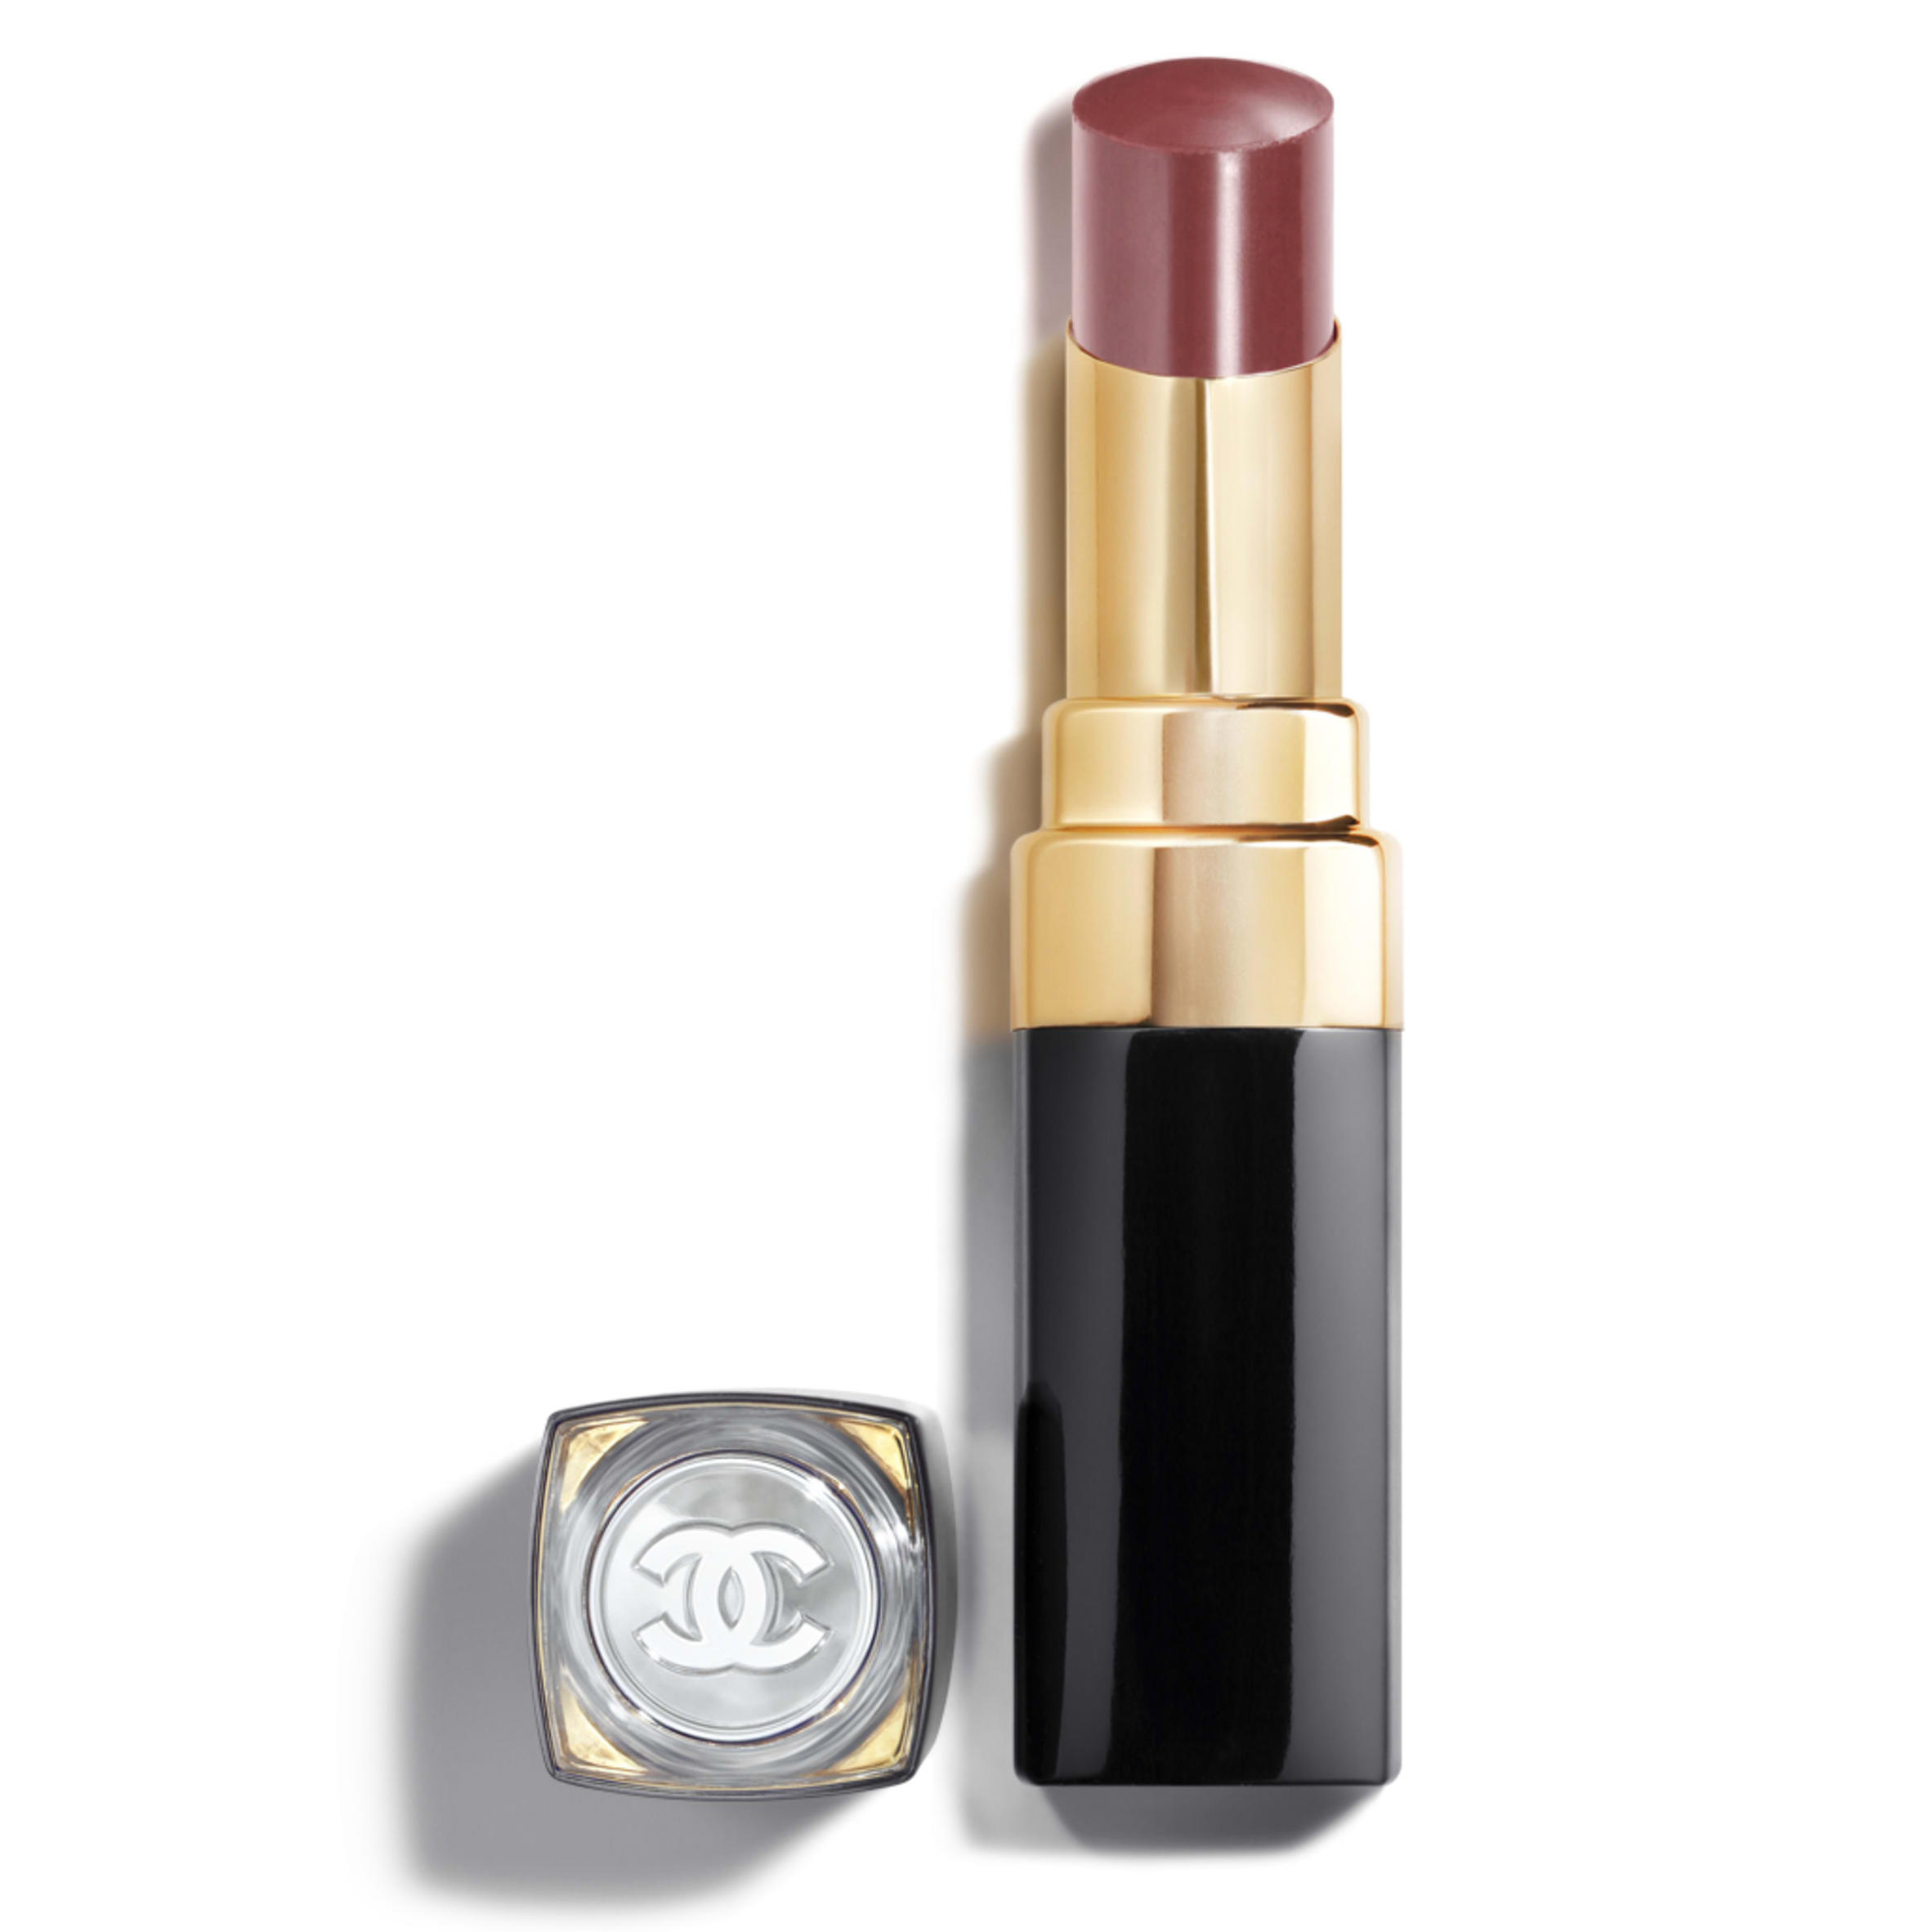 Chanel Rouge Coco Flash Lipstick Contraste 212